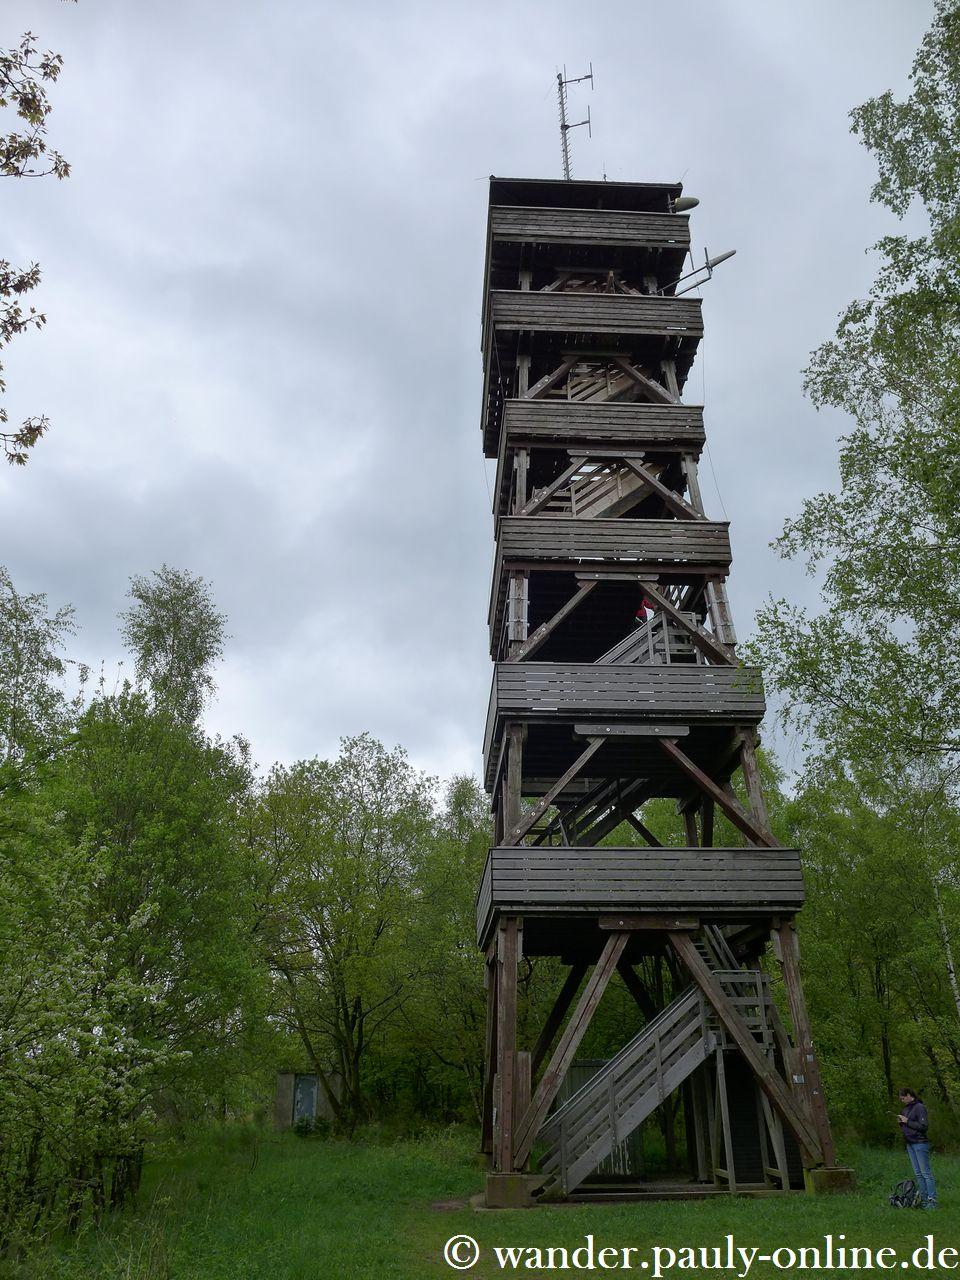 Nationalpark Eifel T7 - Feuerwachturm